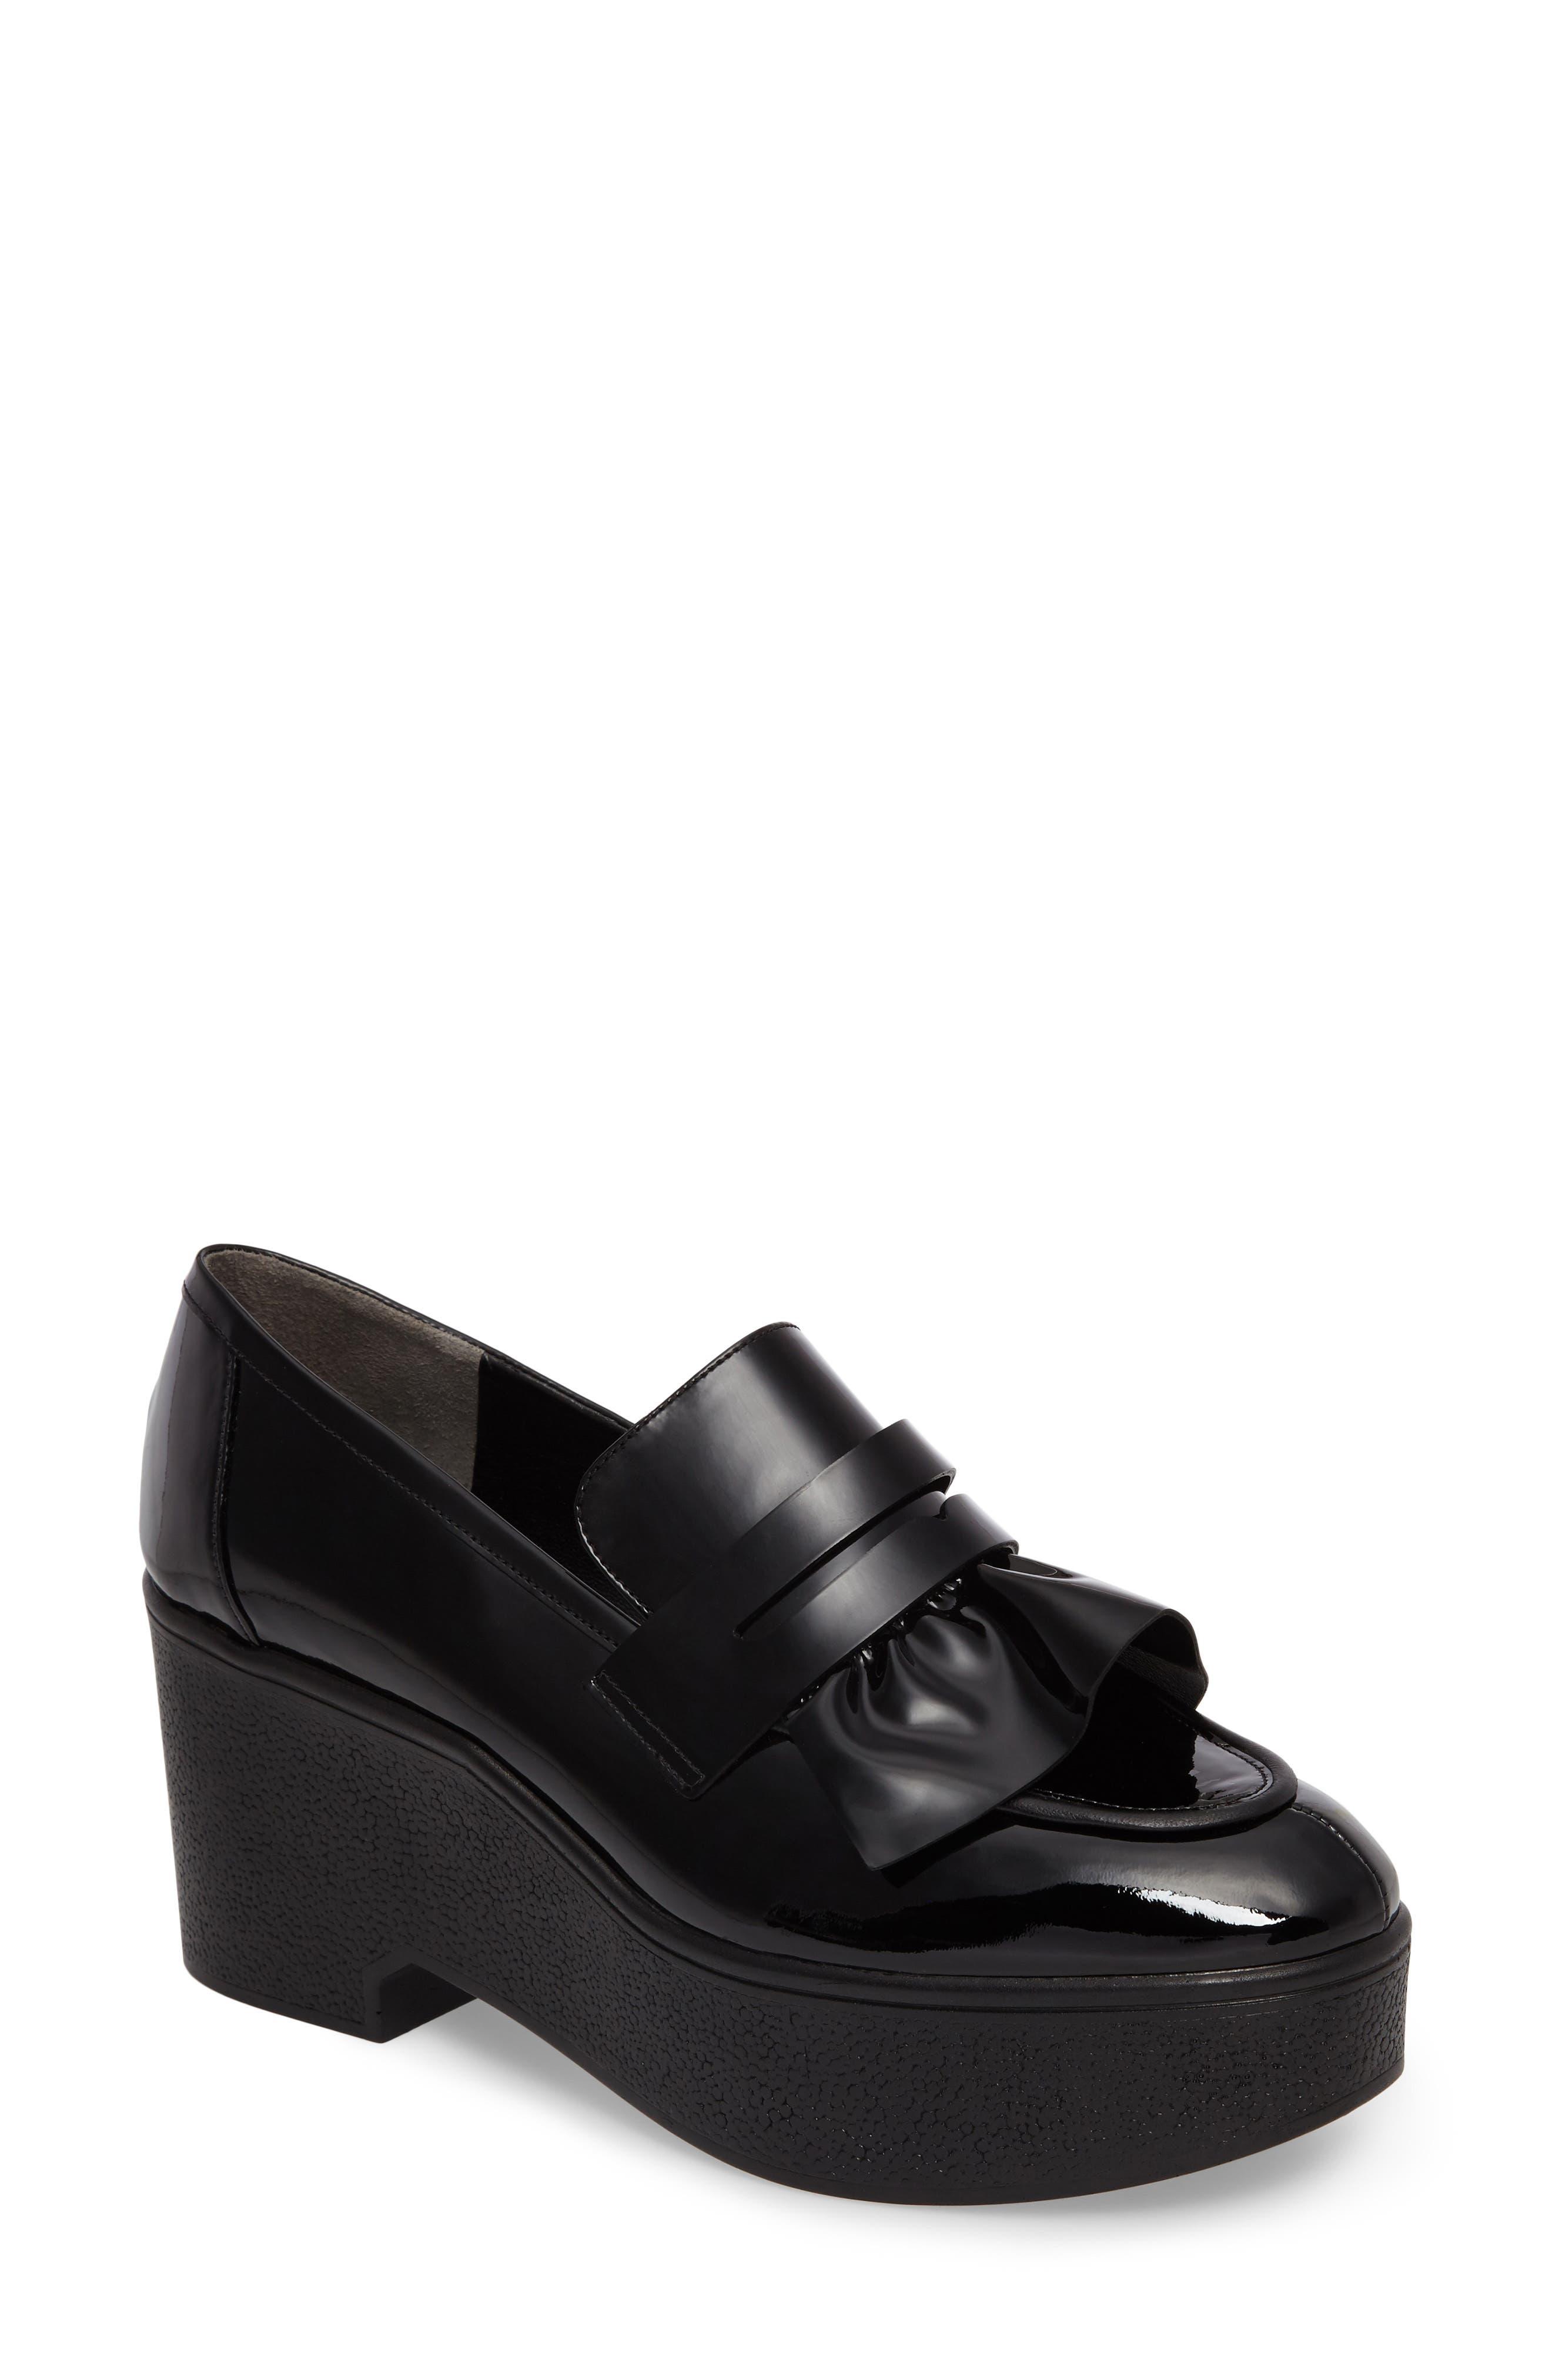 Xock Platform Loafer,                             Main thumbnail 1, color,                             Black